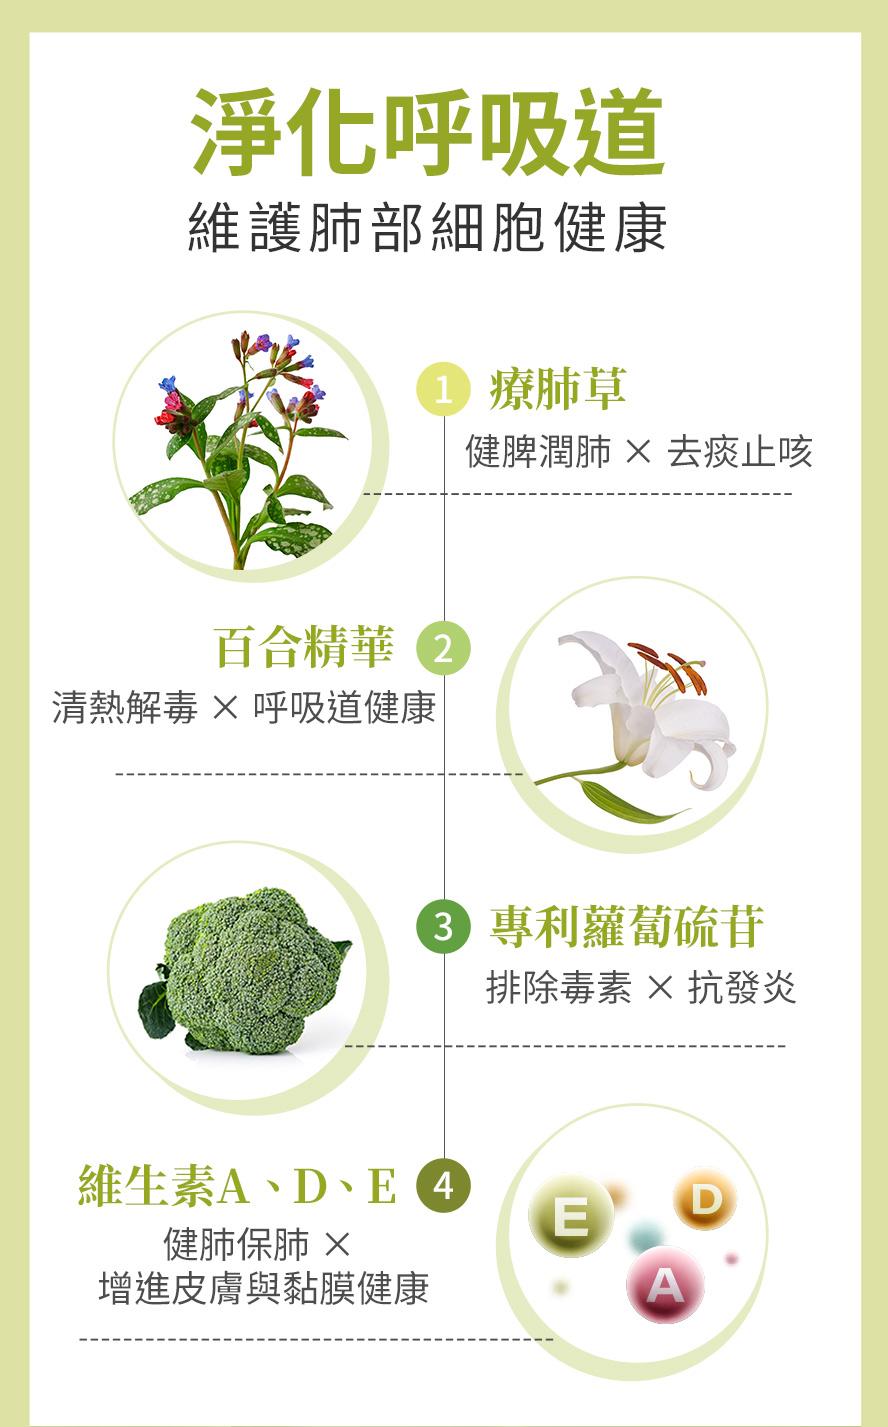 BHK療肺草採用療肺草萃取物,百合濃縮粉,專利蘿蔔硫苷以及維生素A,D,E,讓體內空氣清新.